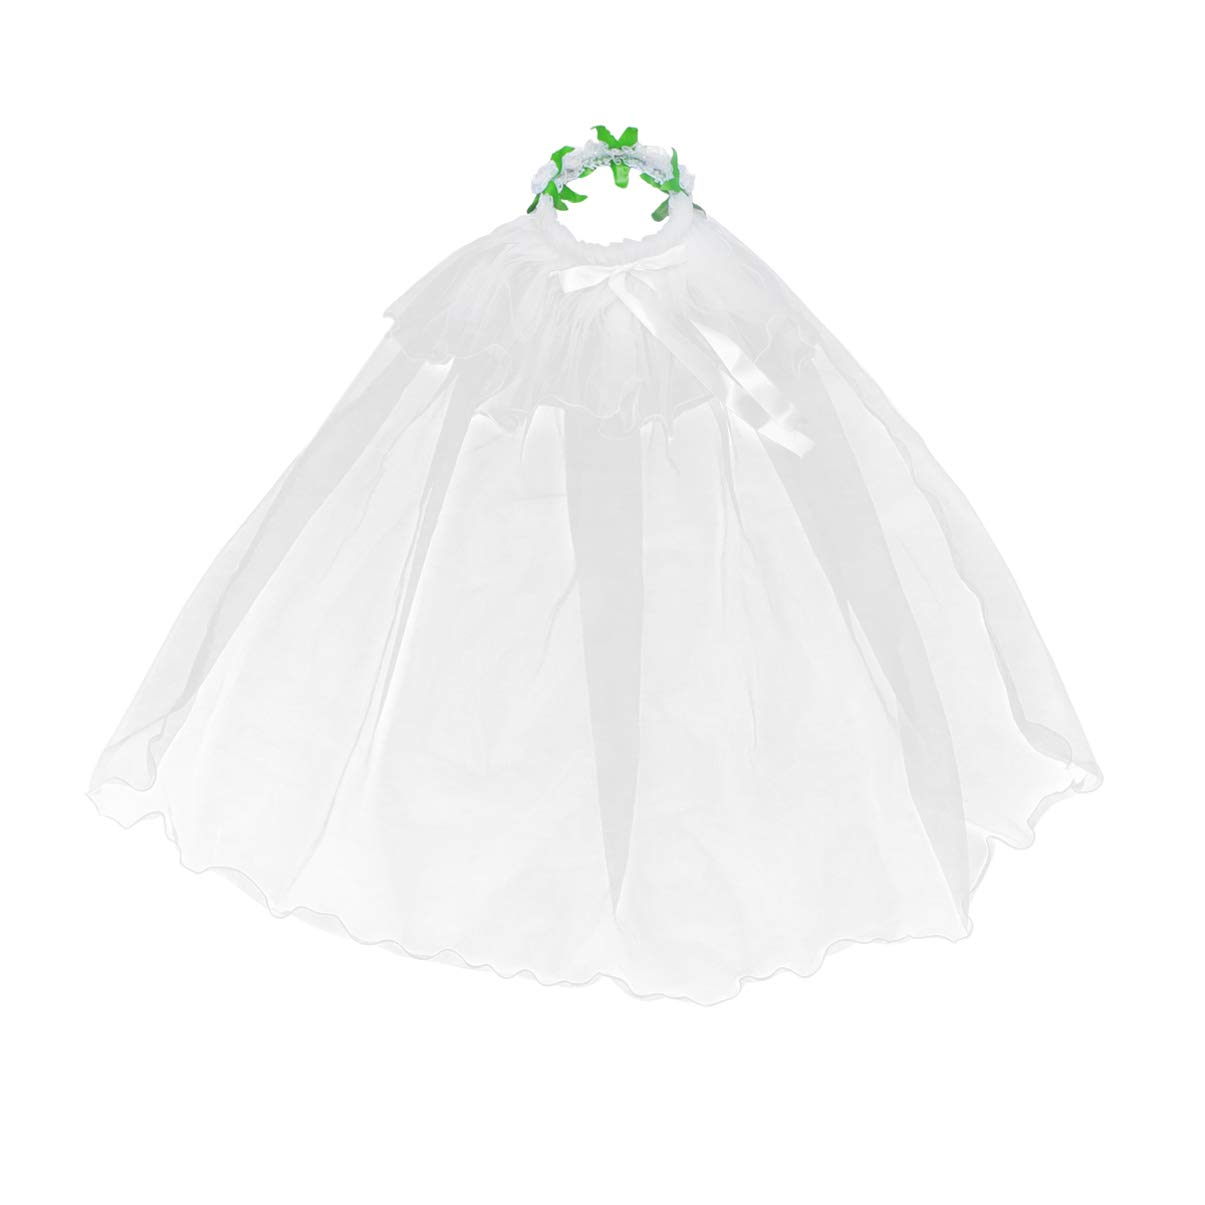 Minkissy Flower Girls Veils First Communion Veils Hair Wreath Two Layers White Wedding Veils Hair Hoop Floral Headpiece (White)